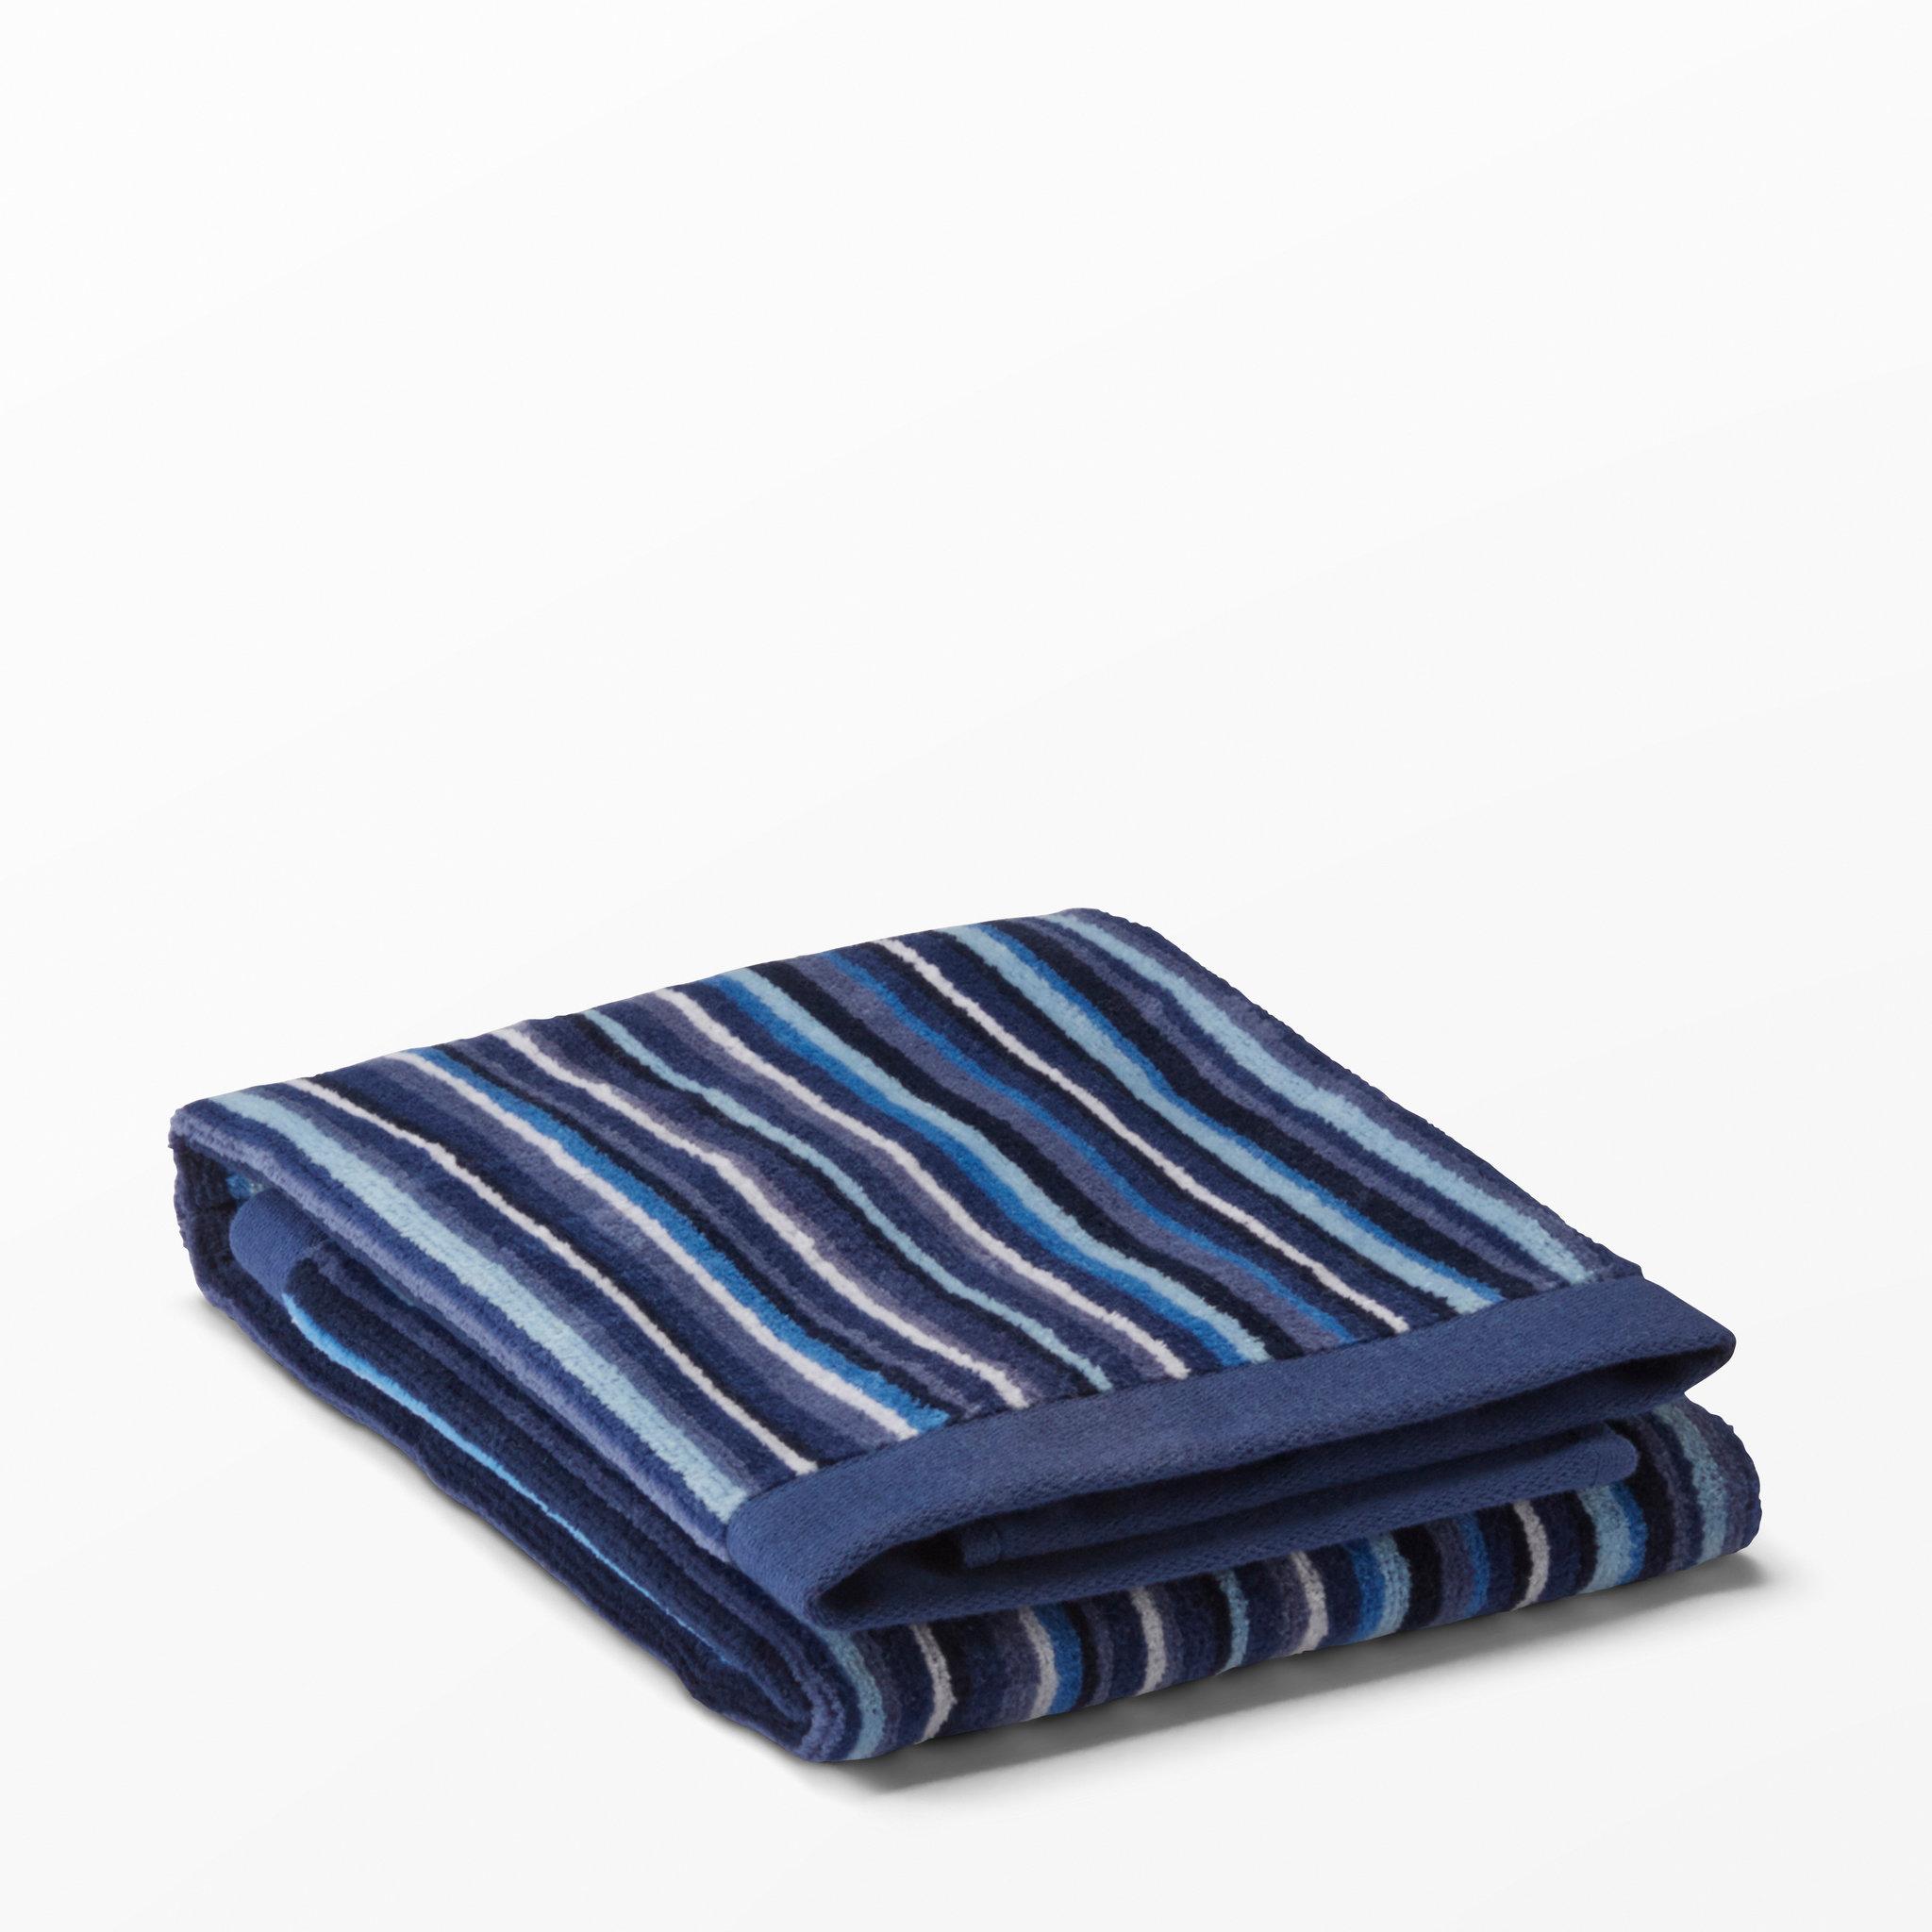 Handduk Rand, 50x70 cm